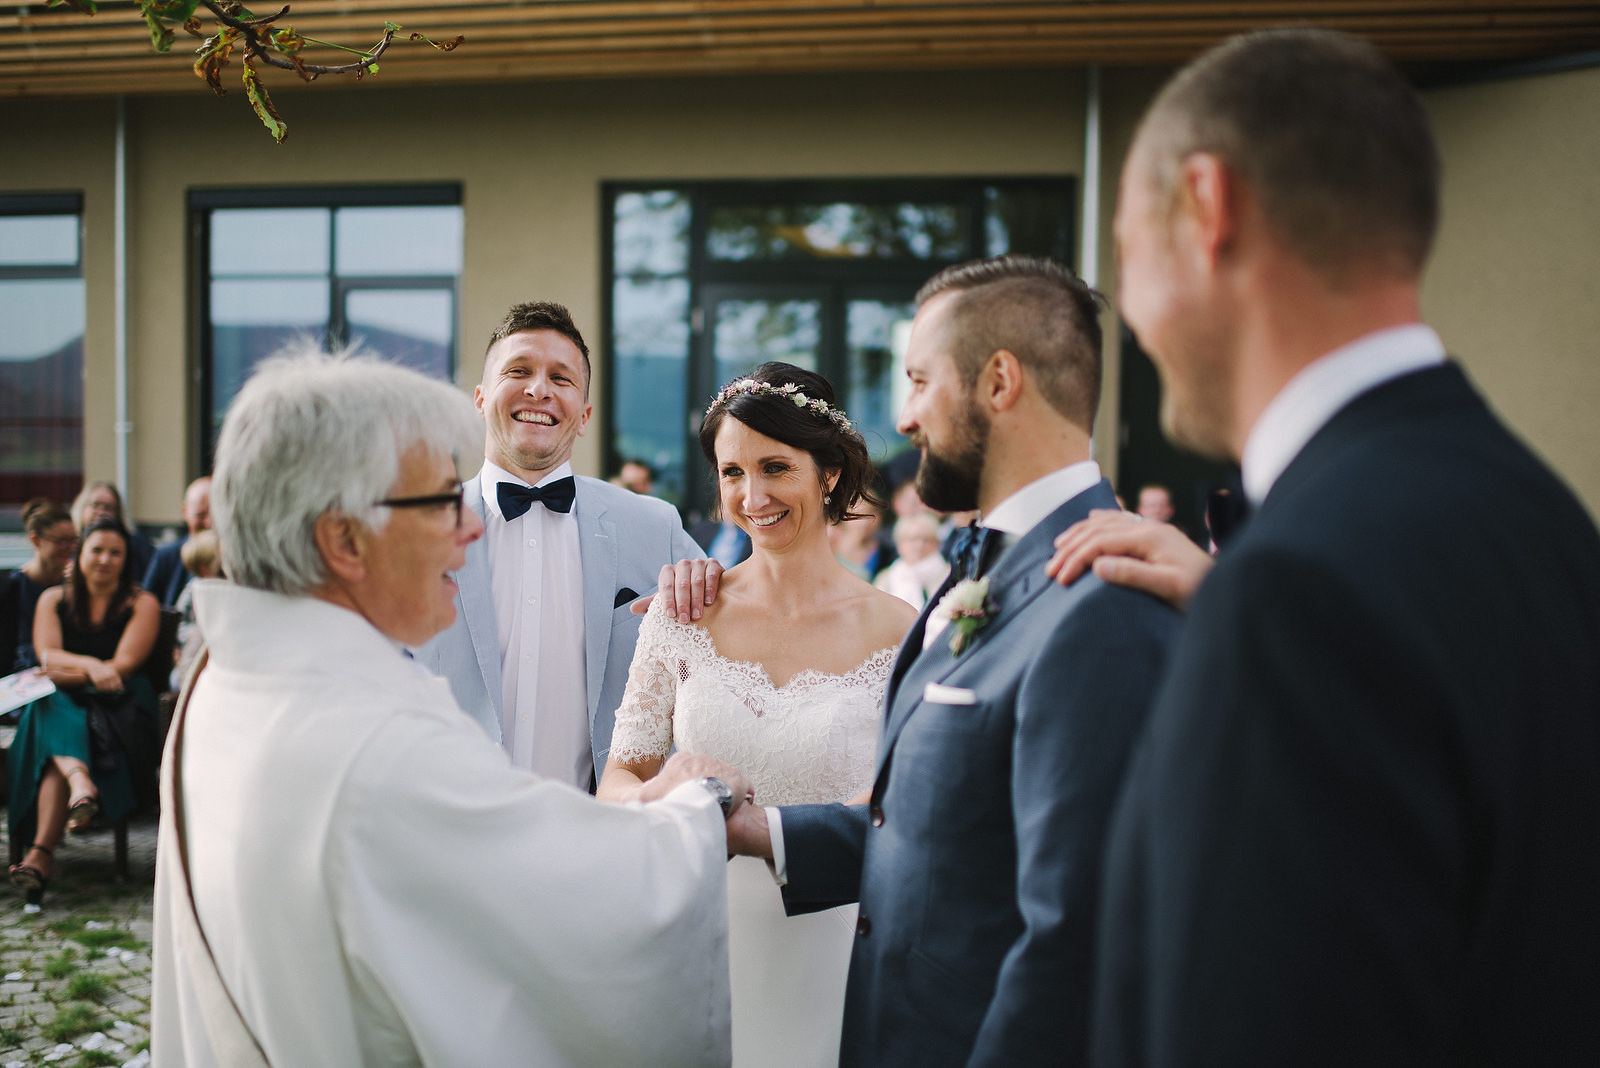 Fotograf Konstanz - Hochzeitsfotograf Reutlingen Achalm Hochzeit EFP 54 - Als Hochzeitsfotograf auf der Achalm, Reutlingen  - 44 -